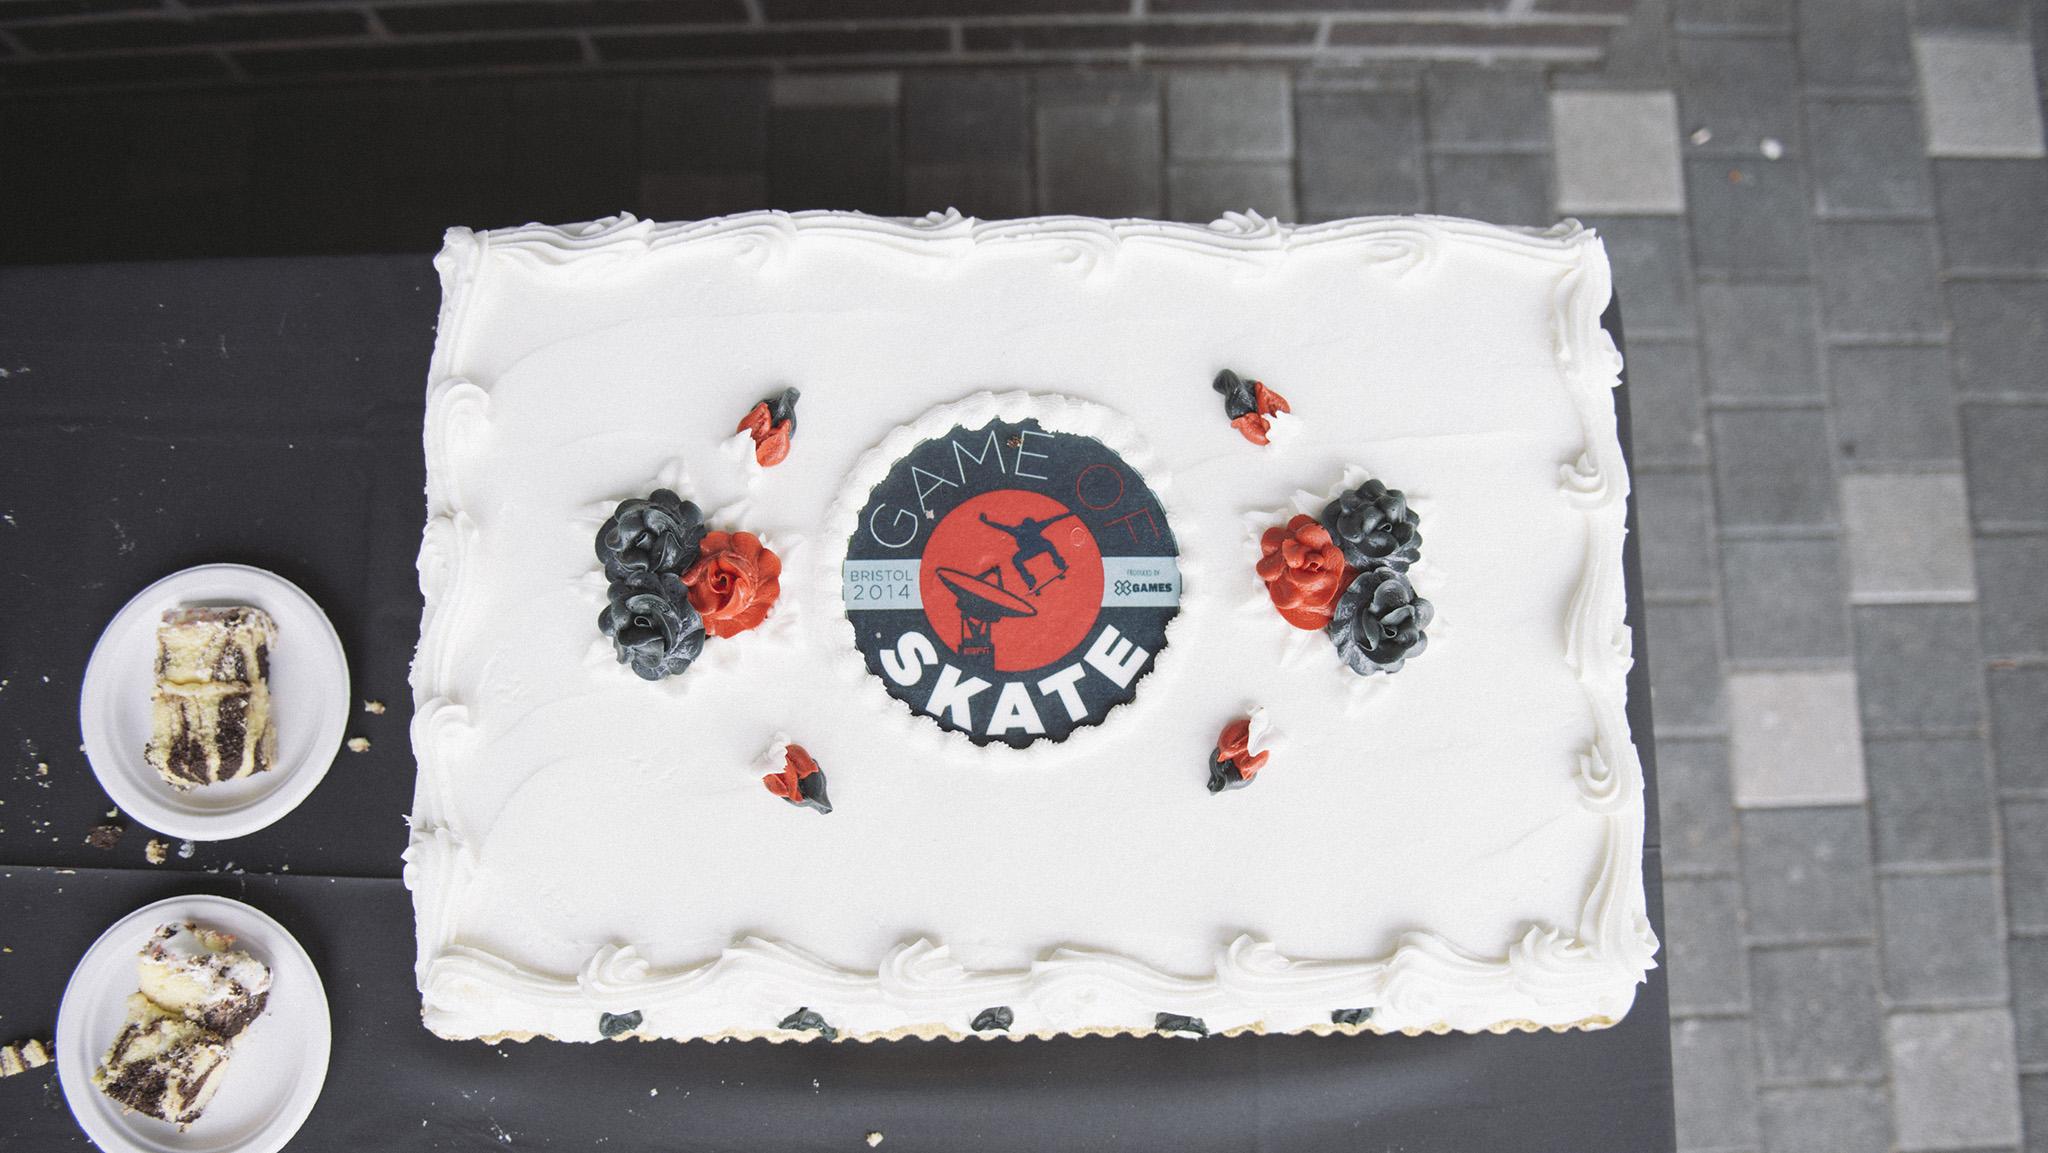 Game of cake